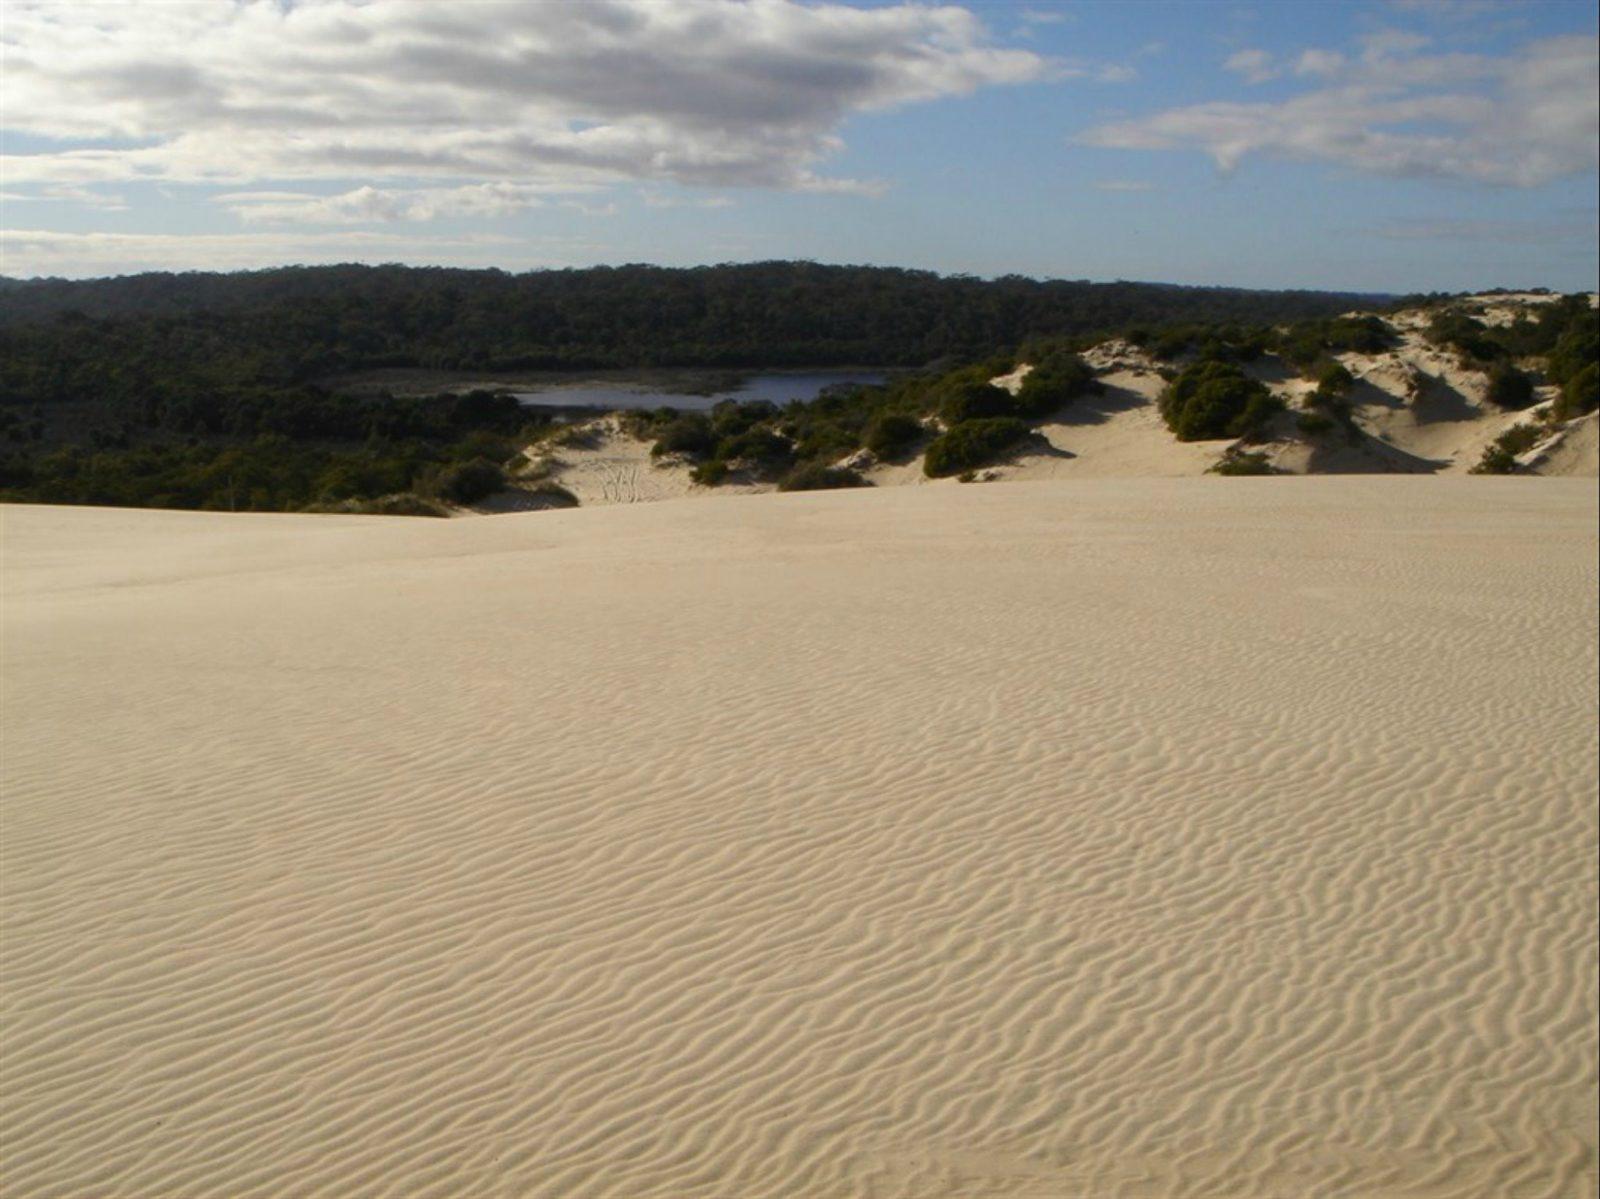 Yeagerup Sand Dunes, Pemberton, Western Australia